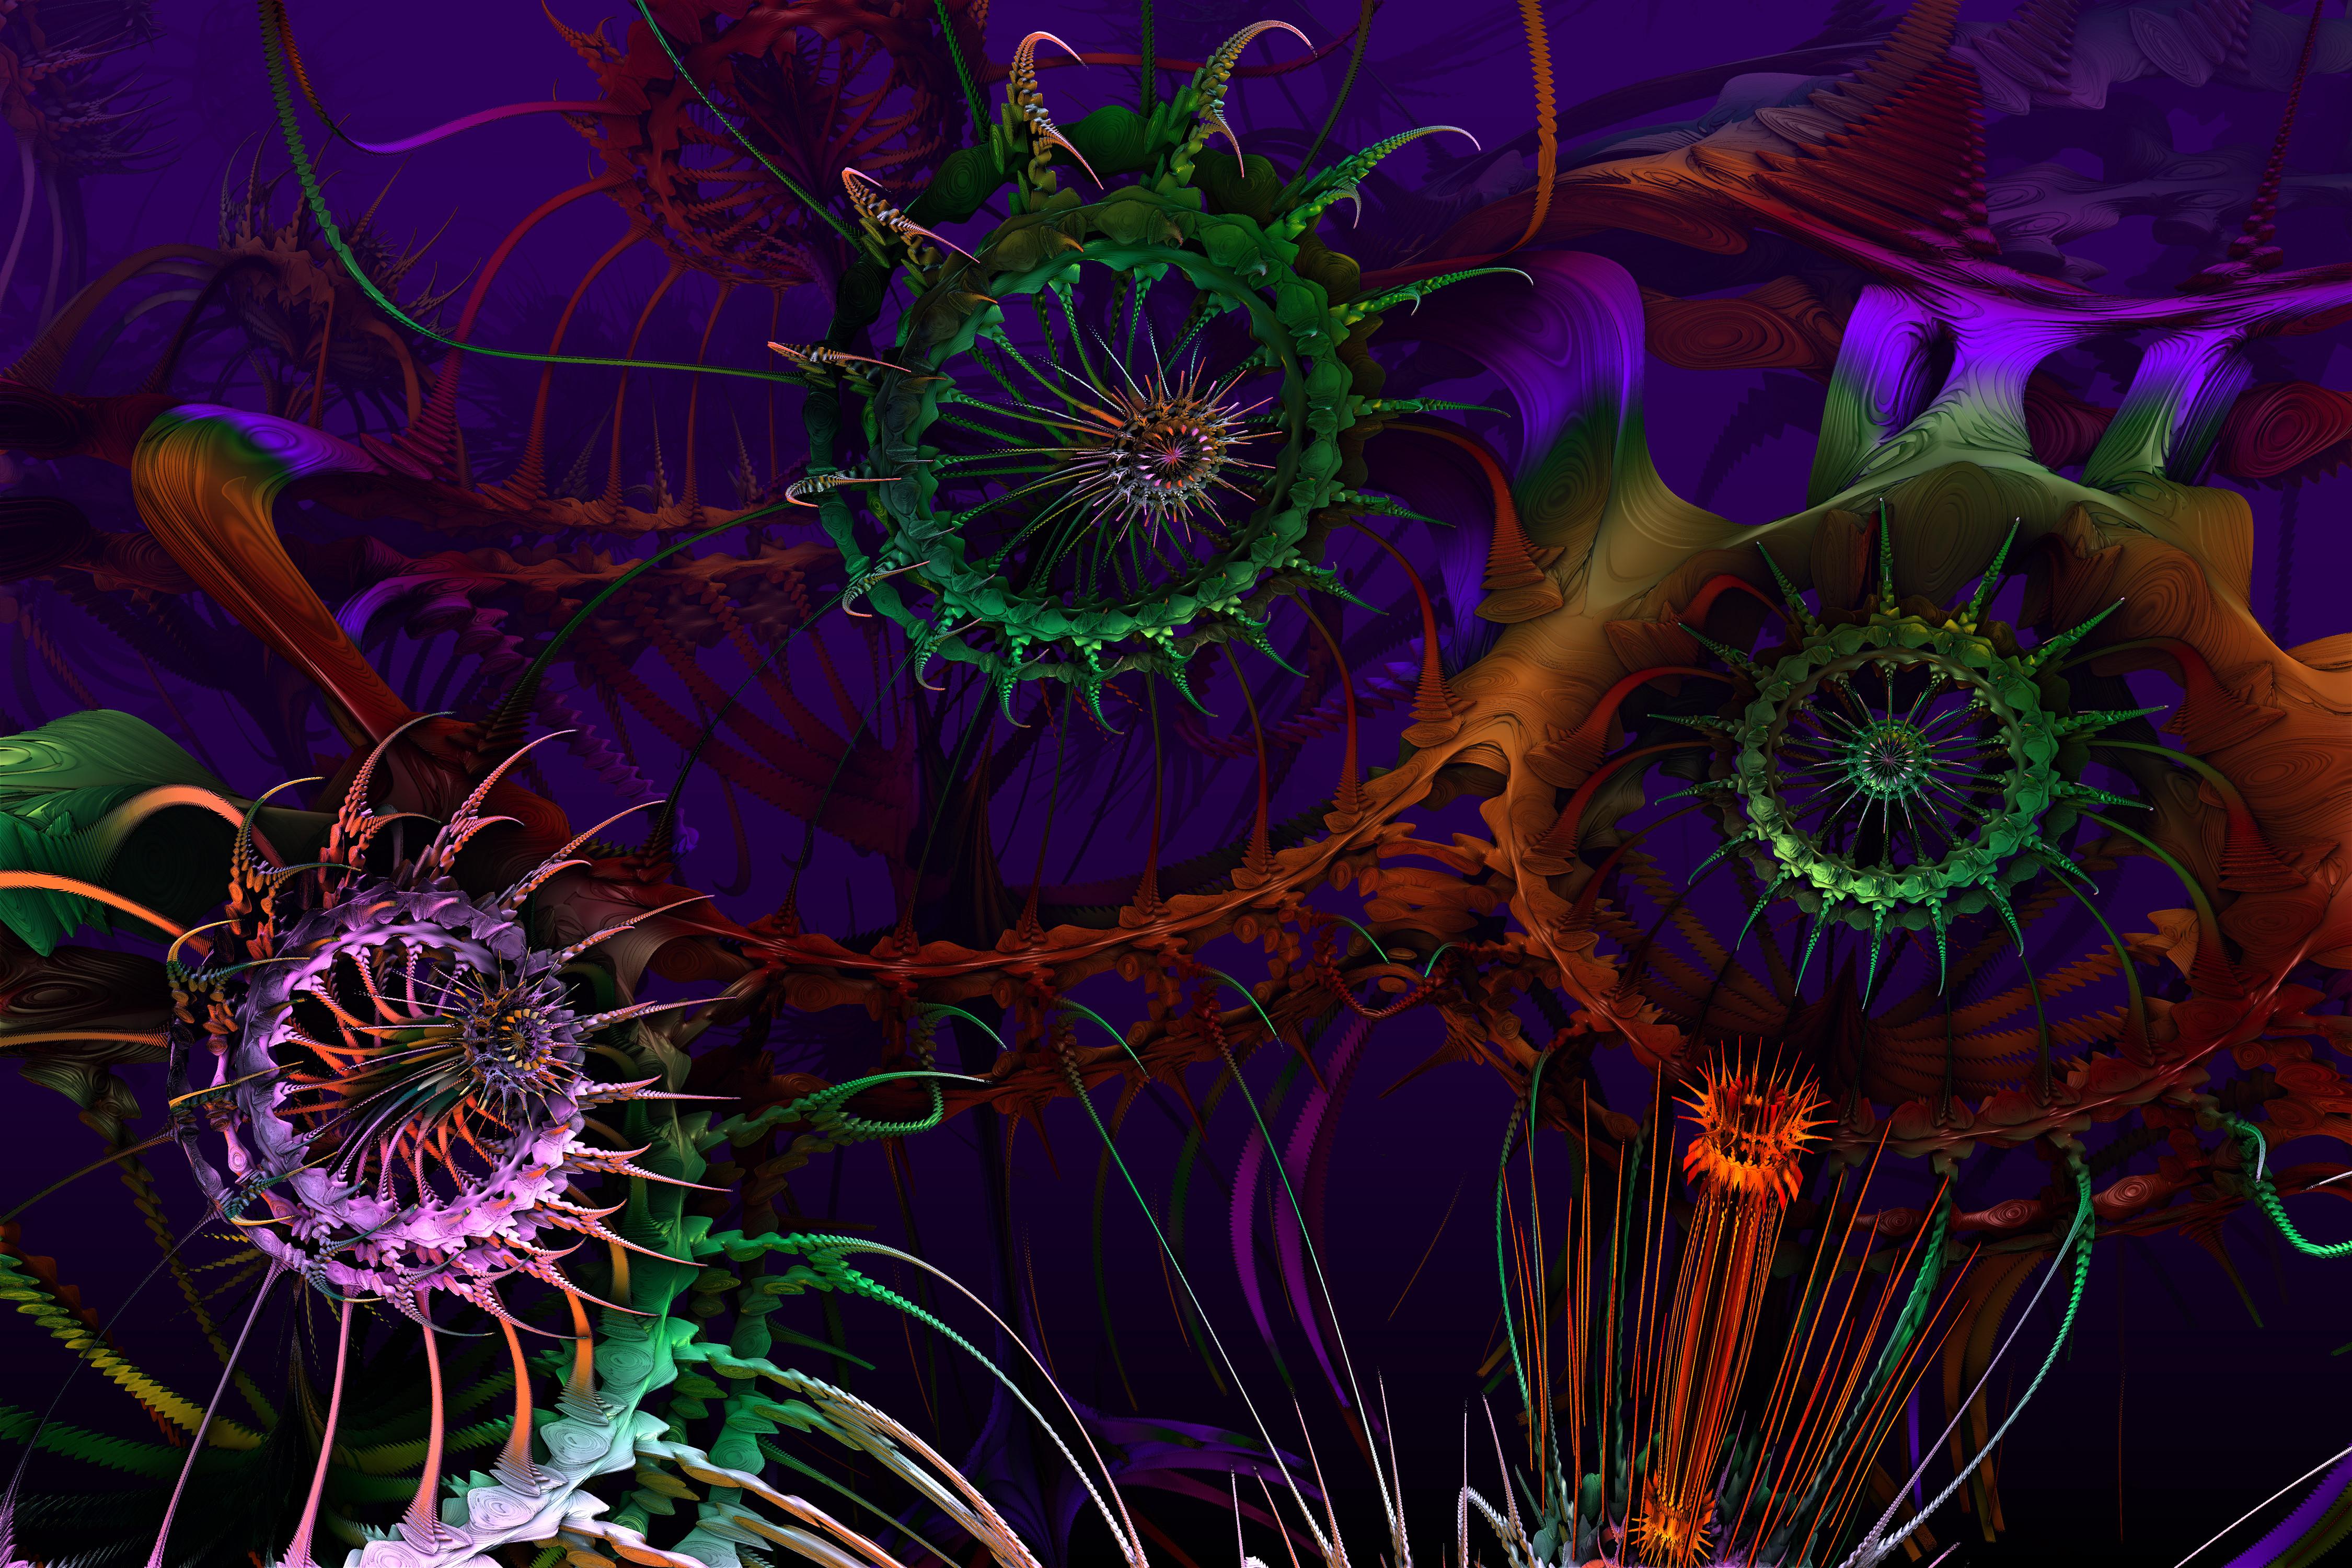 Fractillus Carnivorous by GrahamSym